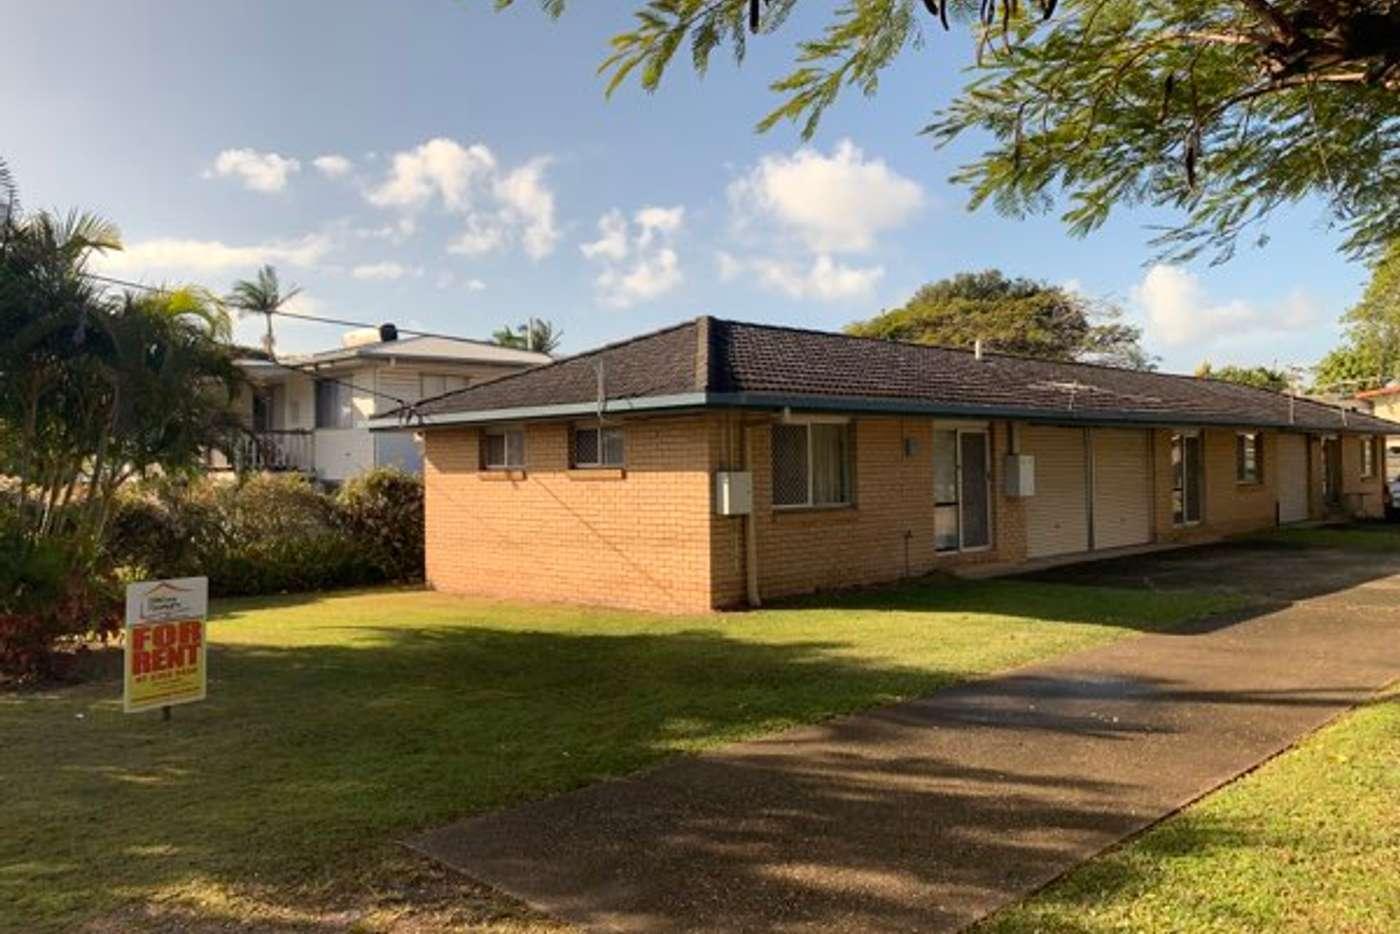 Main view of Homely unit listing, 2/291 Anzac Avenue, Kippa-ring QLD 4021